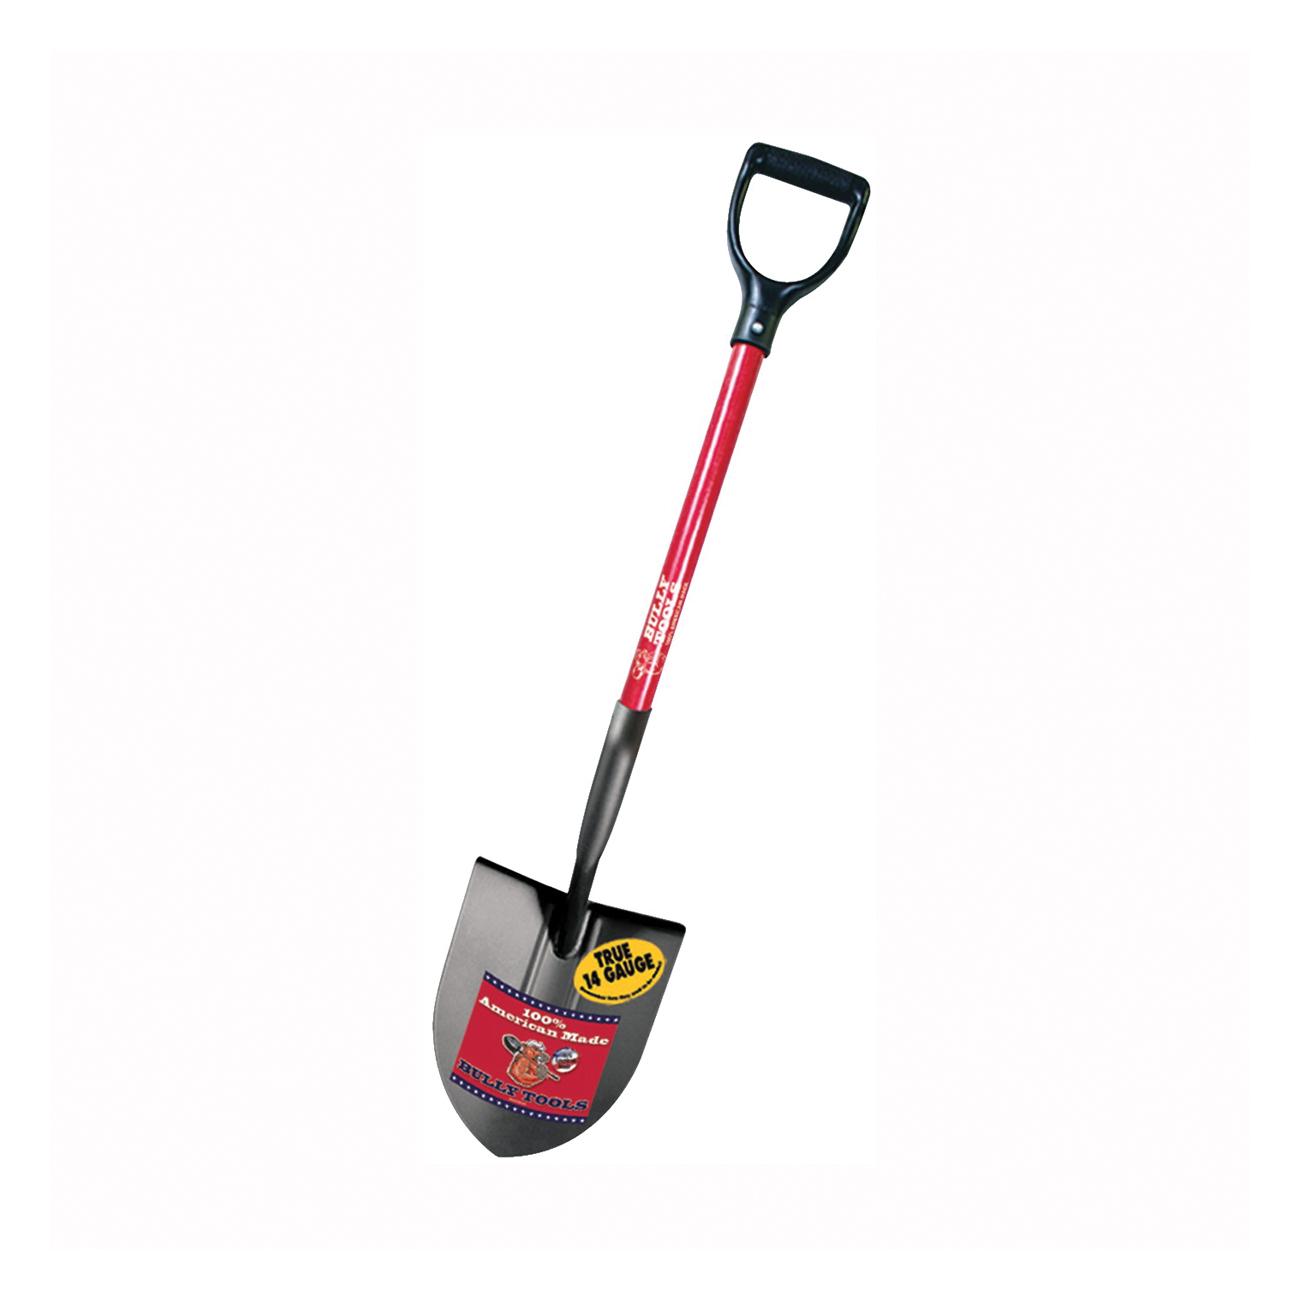 Picture of BULLY Tools 82510 Digging Shovel, 9 in W Blade, 14 ga Gauge, American Steel Blade, Fiberglass Handle